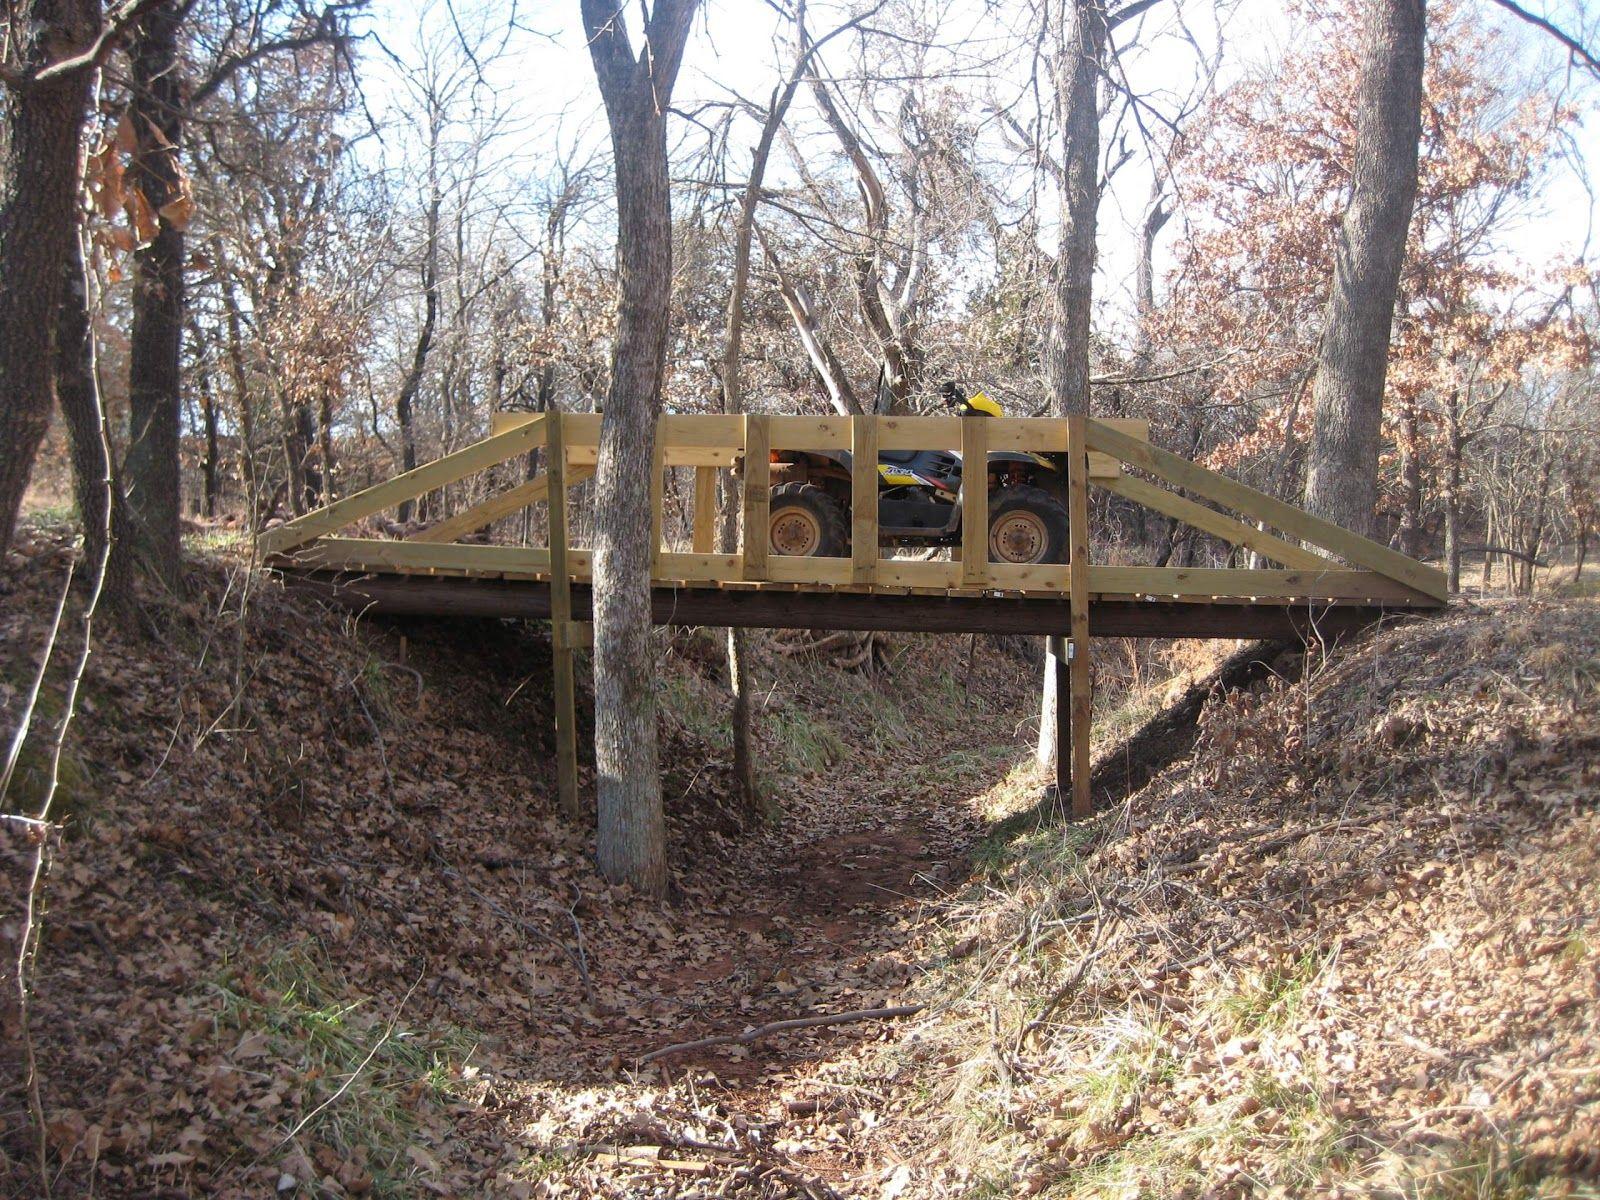 building small bridge over creek bridges pinterest garden bridge bridge and garden. Black Bedroom Furniture Sets. Home Design Ideas